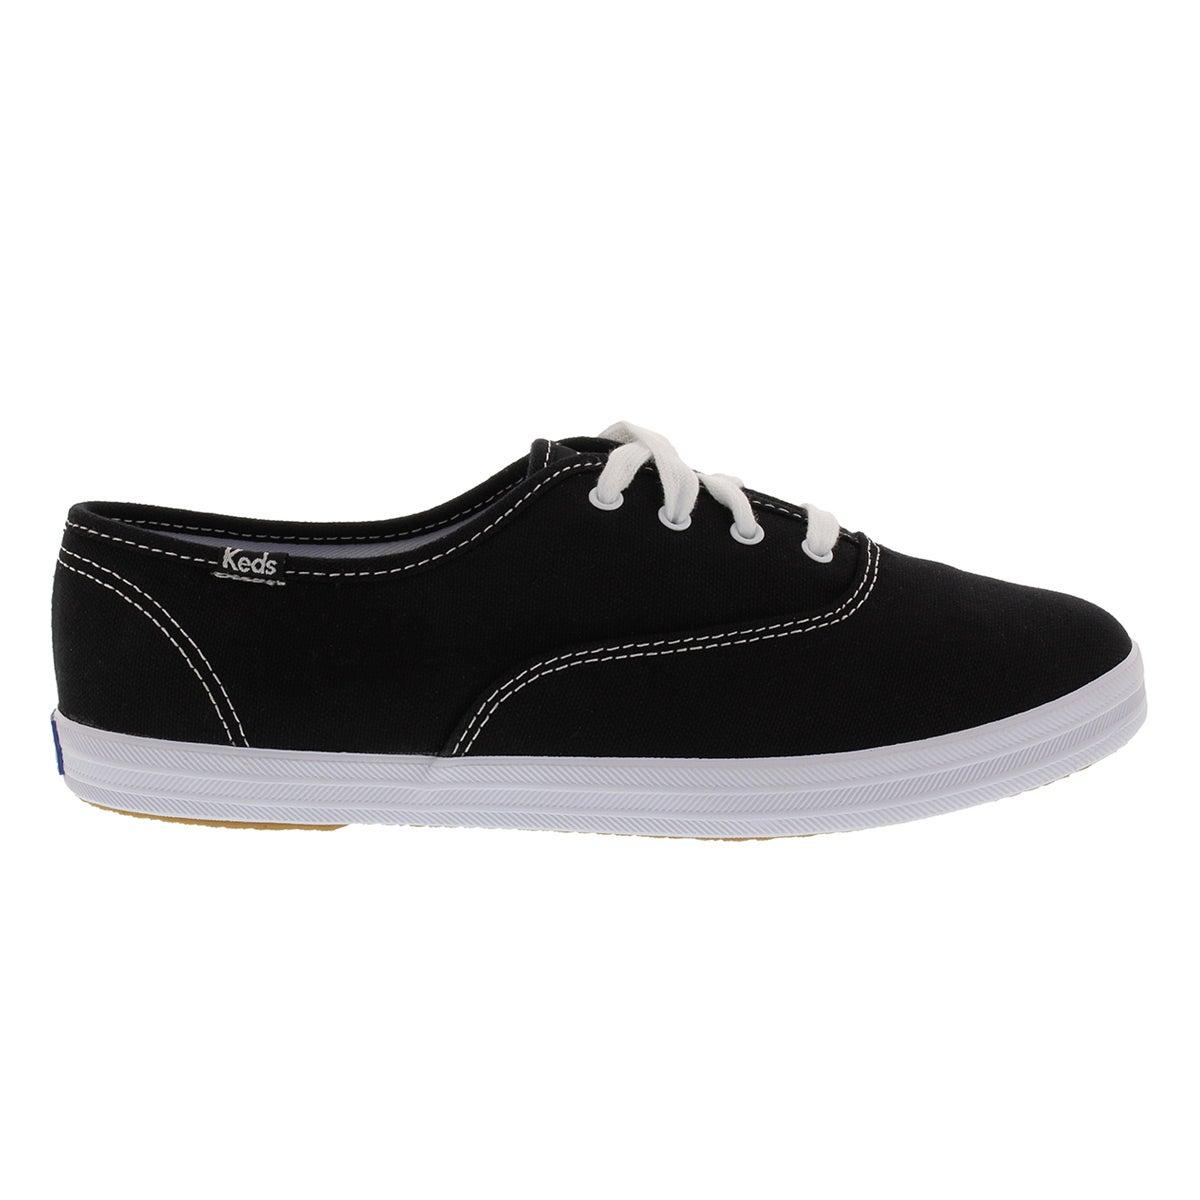 Lds Champion blk canvas sneaker - X Wide